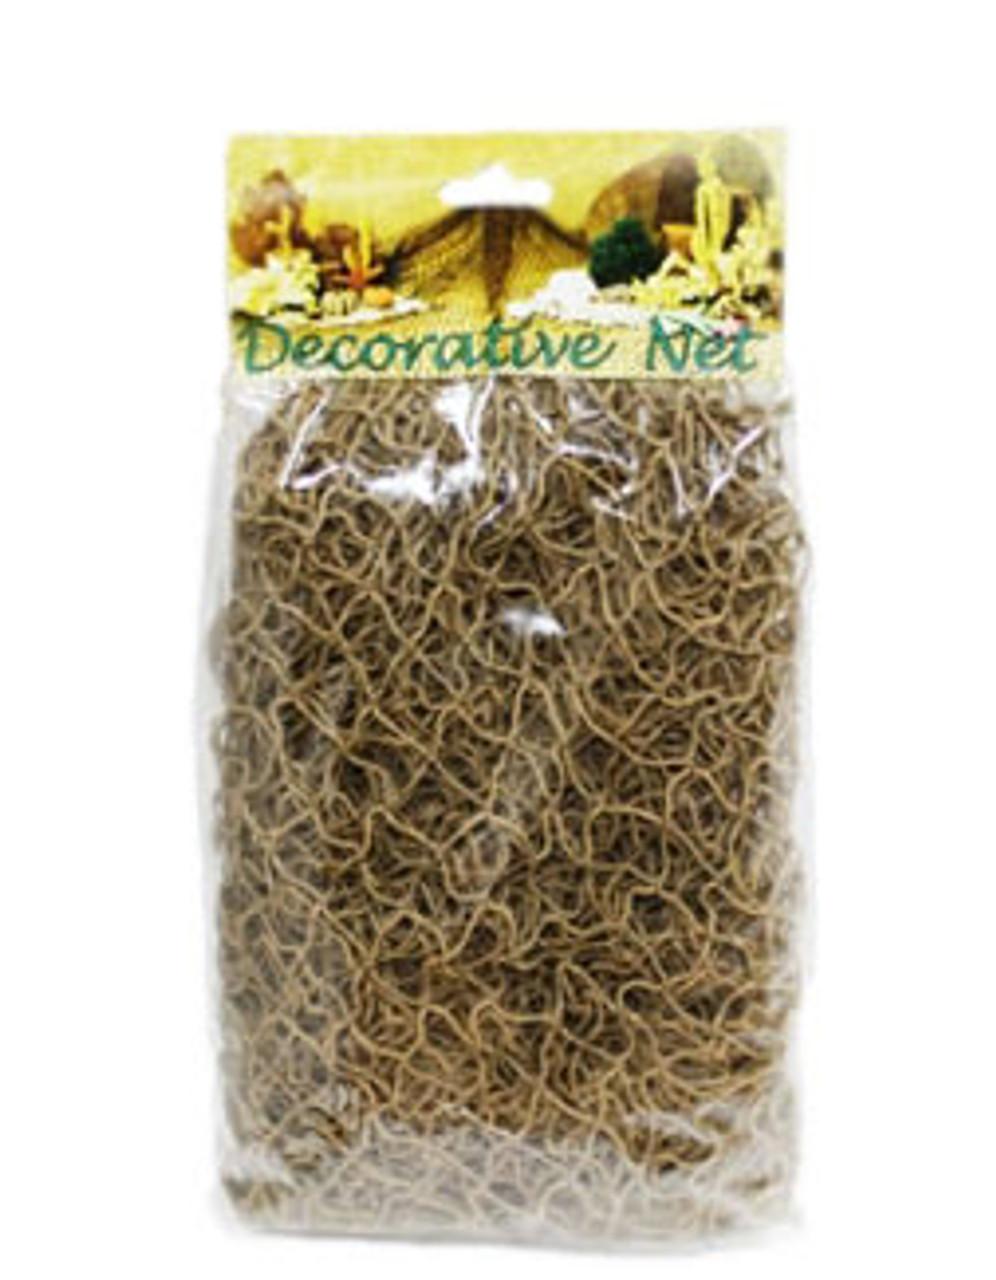 Decorative Scrap Net with Header